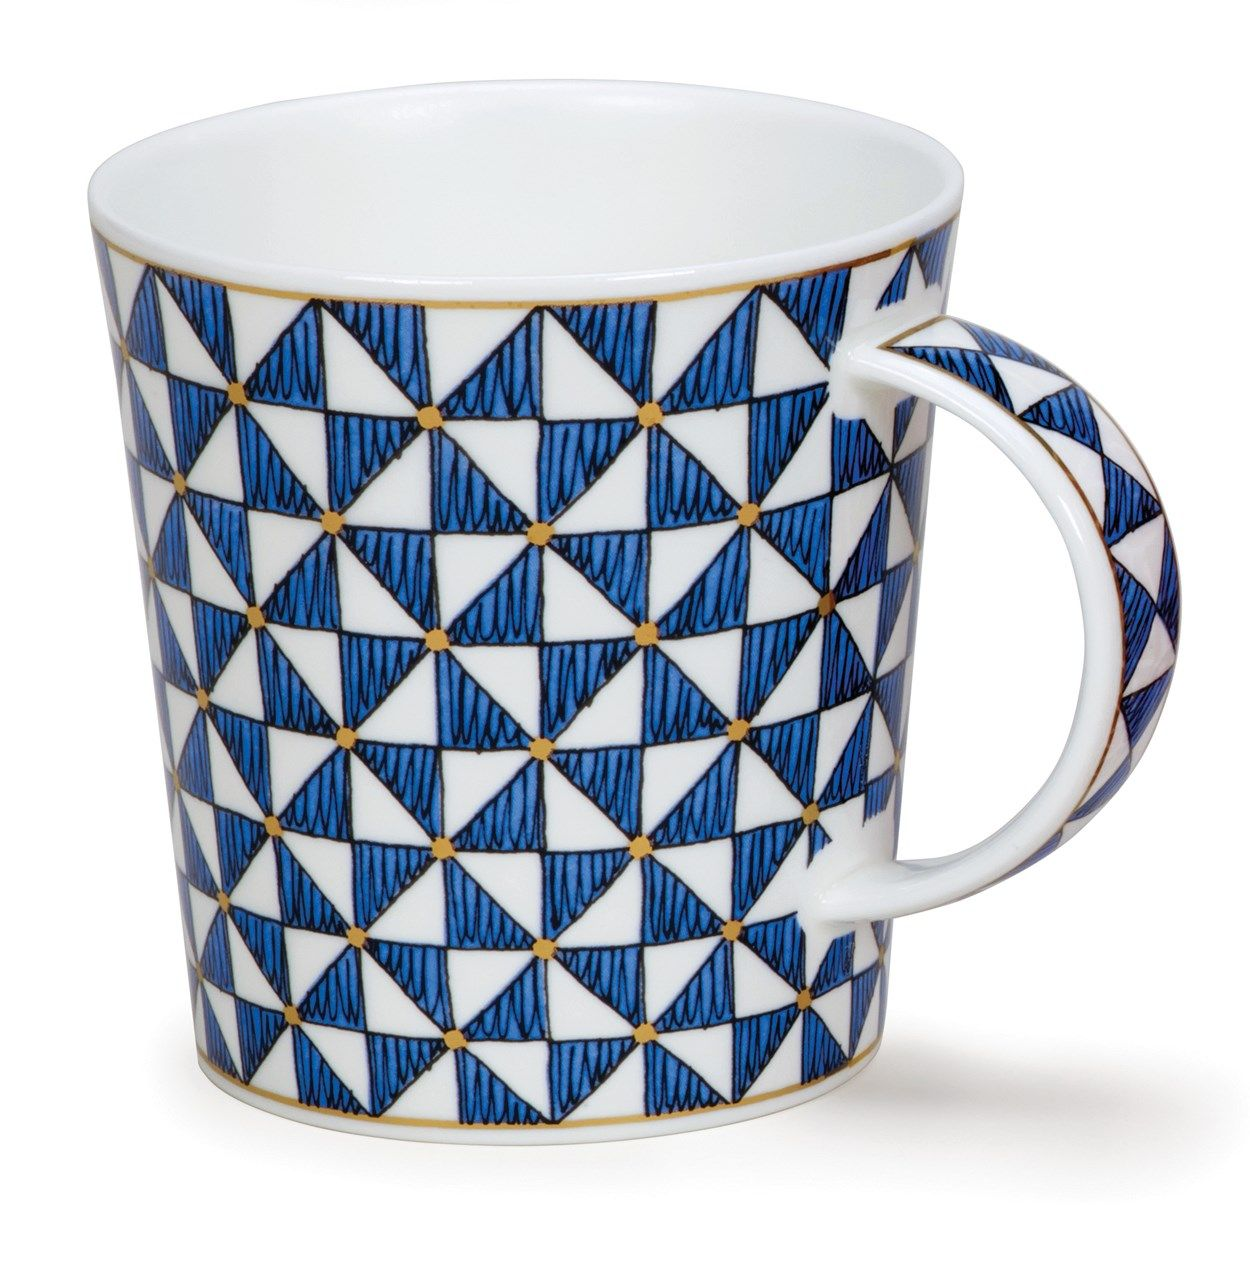 Erlesene Tees, Kaffee & Dunoon Becher vom Kubek, Produkty